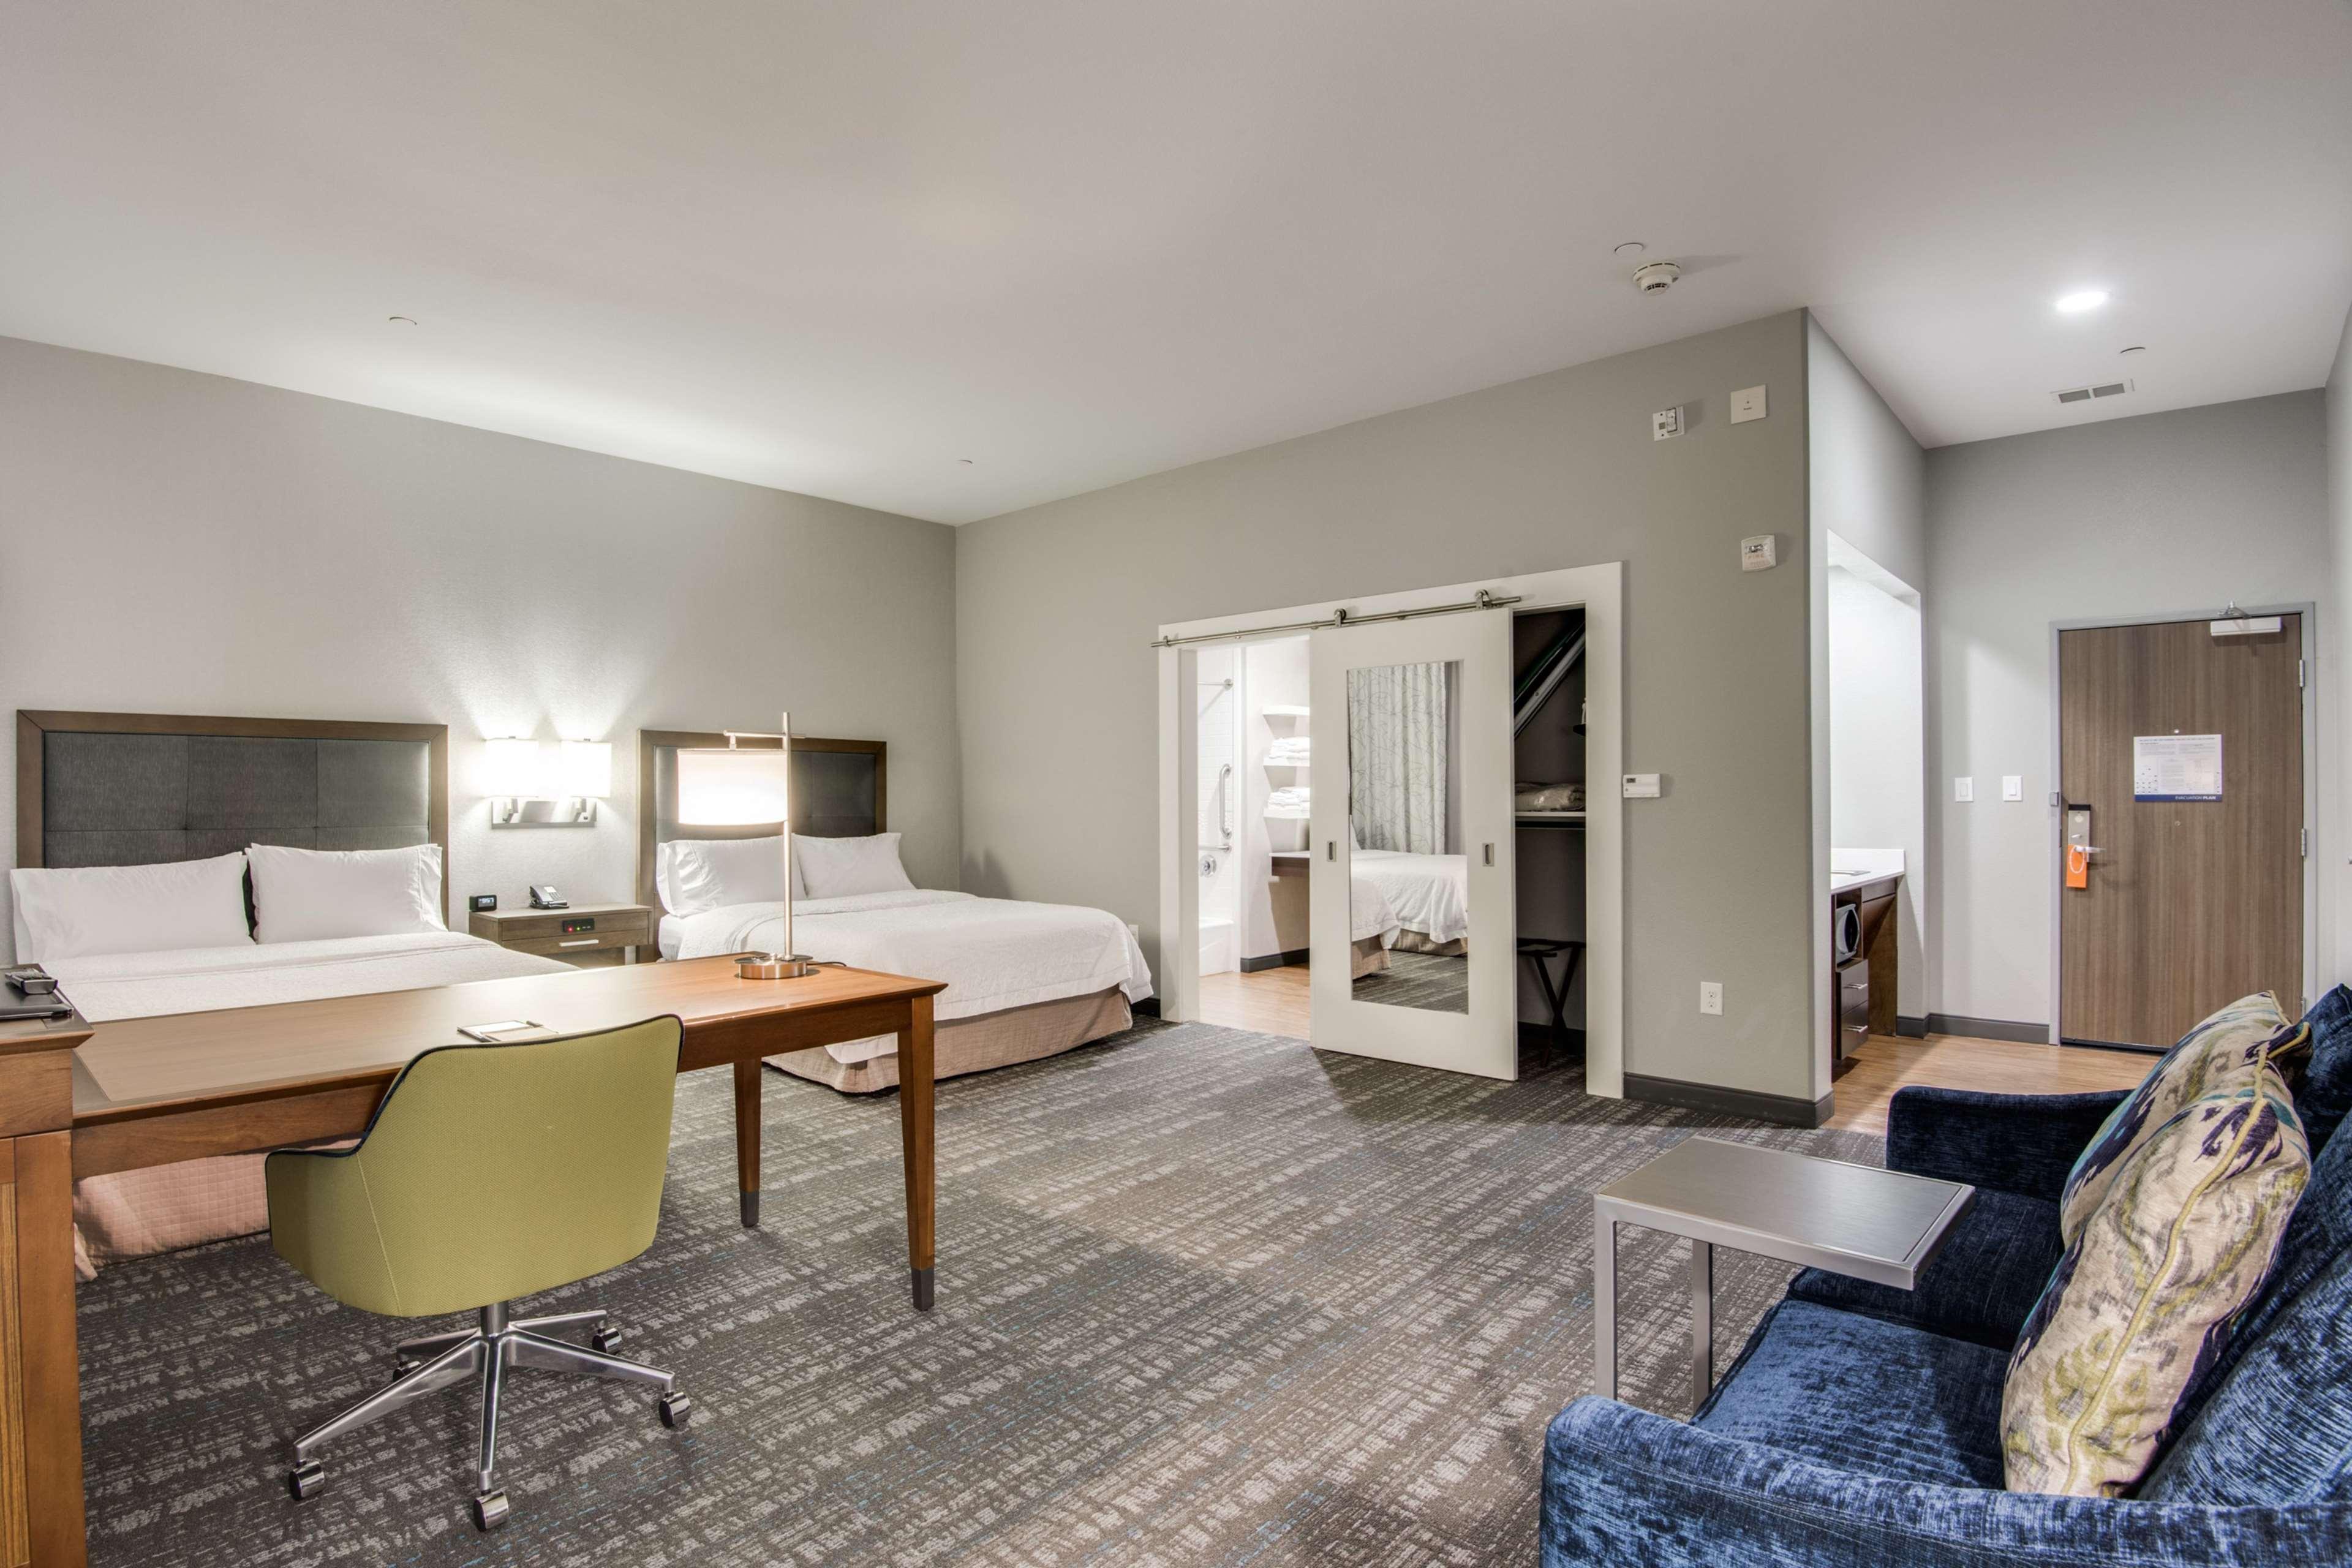 Hampton Inn & Suites Dallas/Ft. Worth Airport South image 18